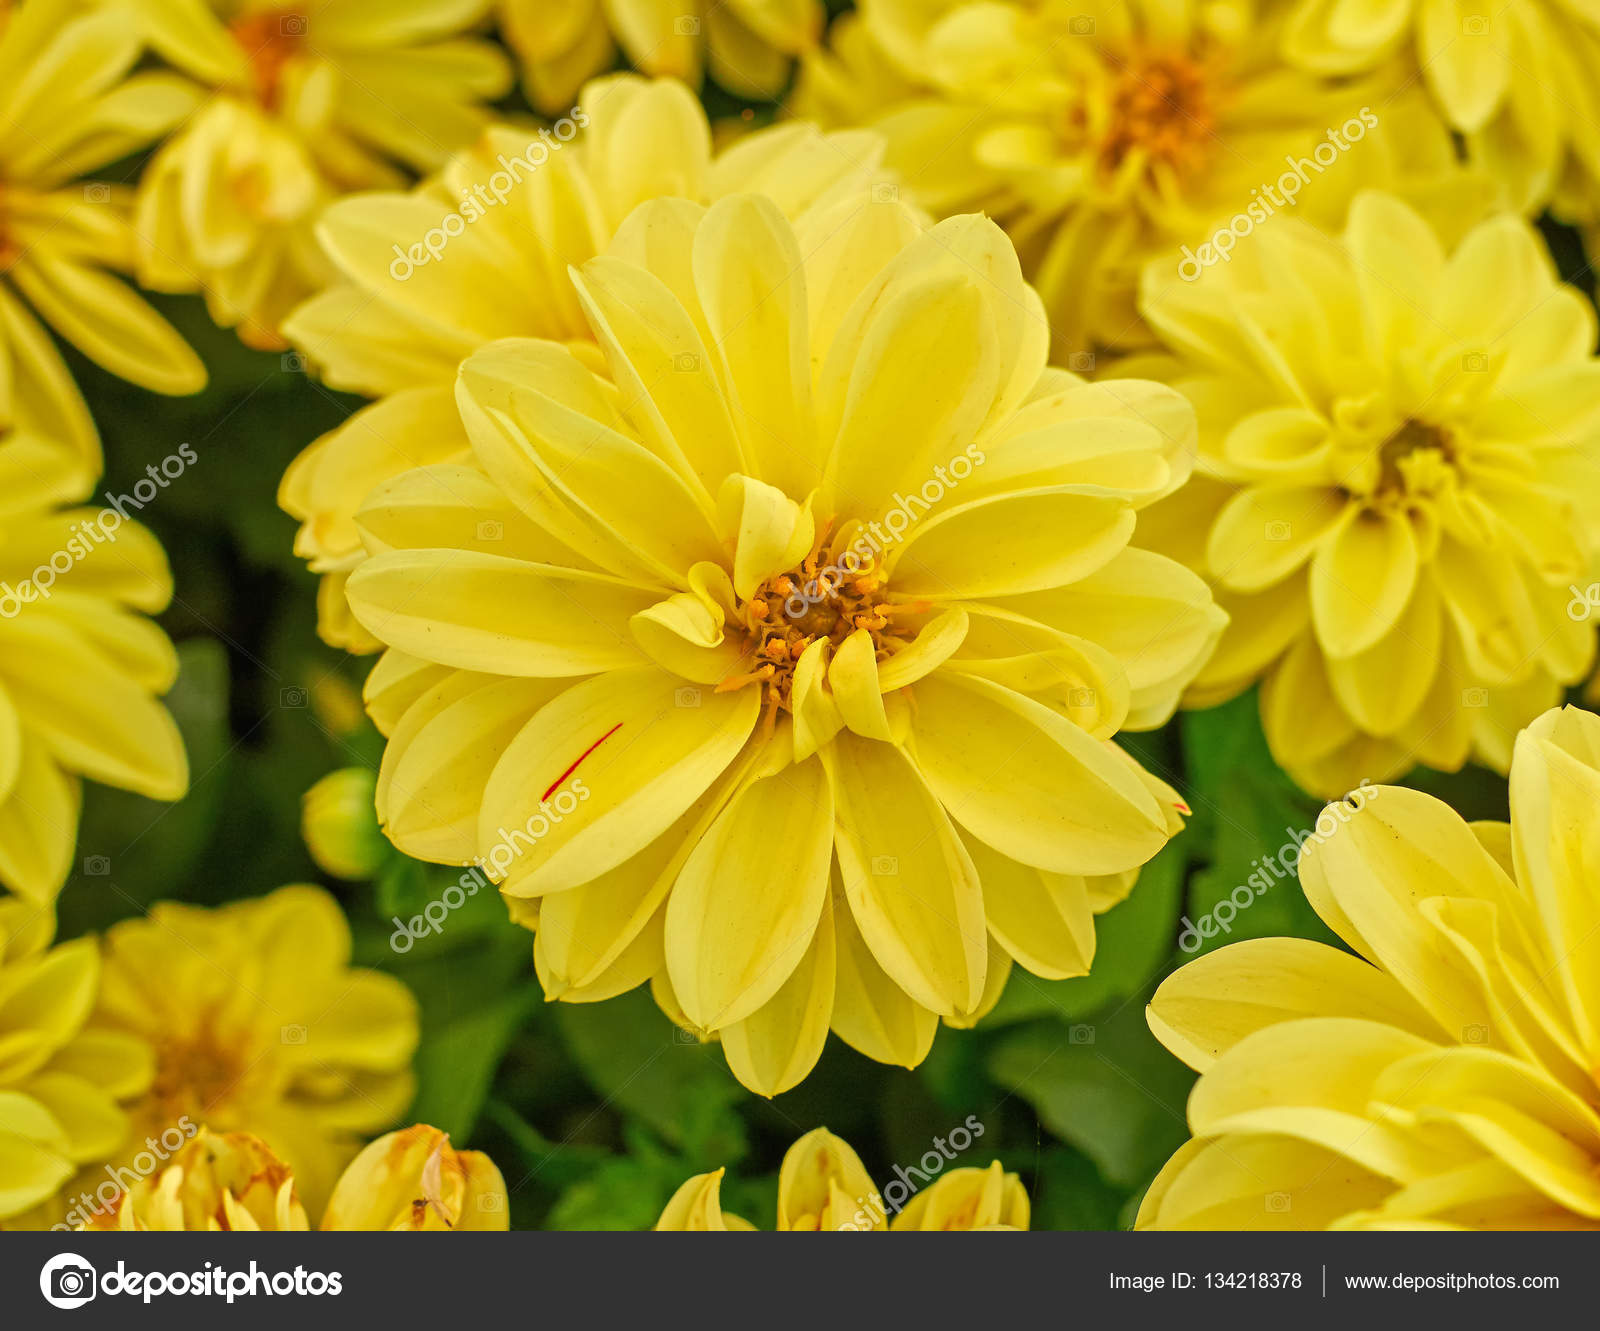 Yellow Dahlia Flower Closeup Stock Photo Dimitriosp 134218378